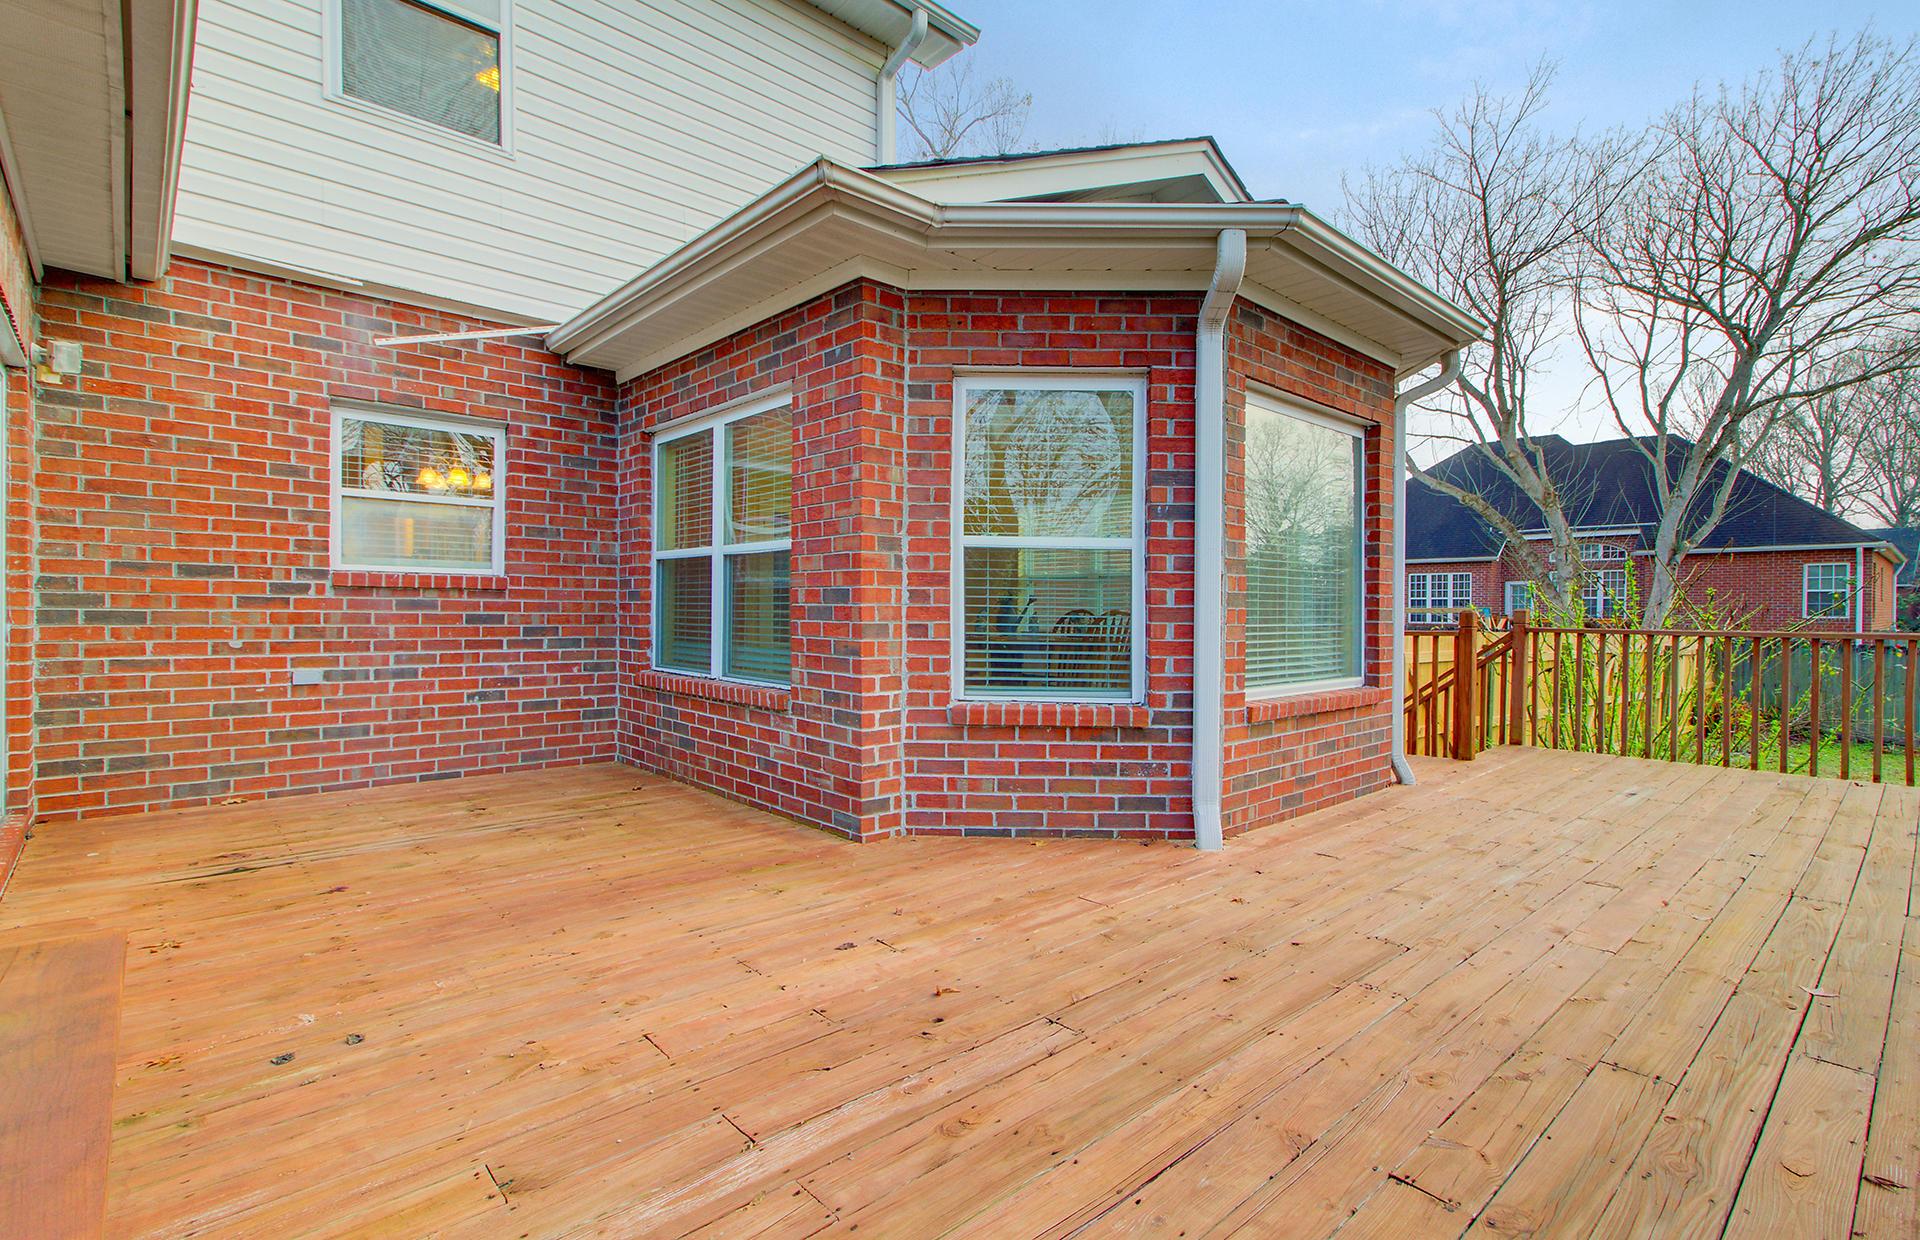 Bakers Landing Homes For Sale - 105 River Oak, North Charleston, SC - 32